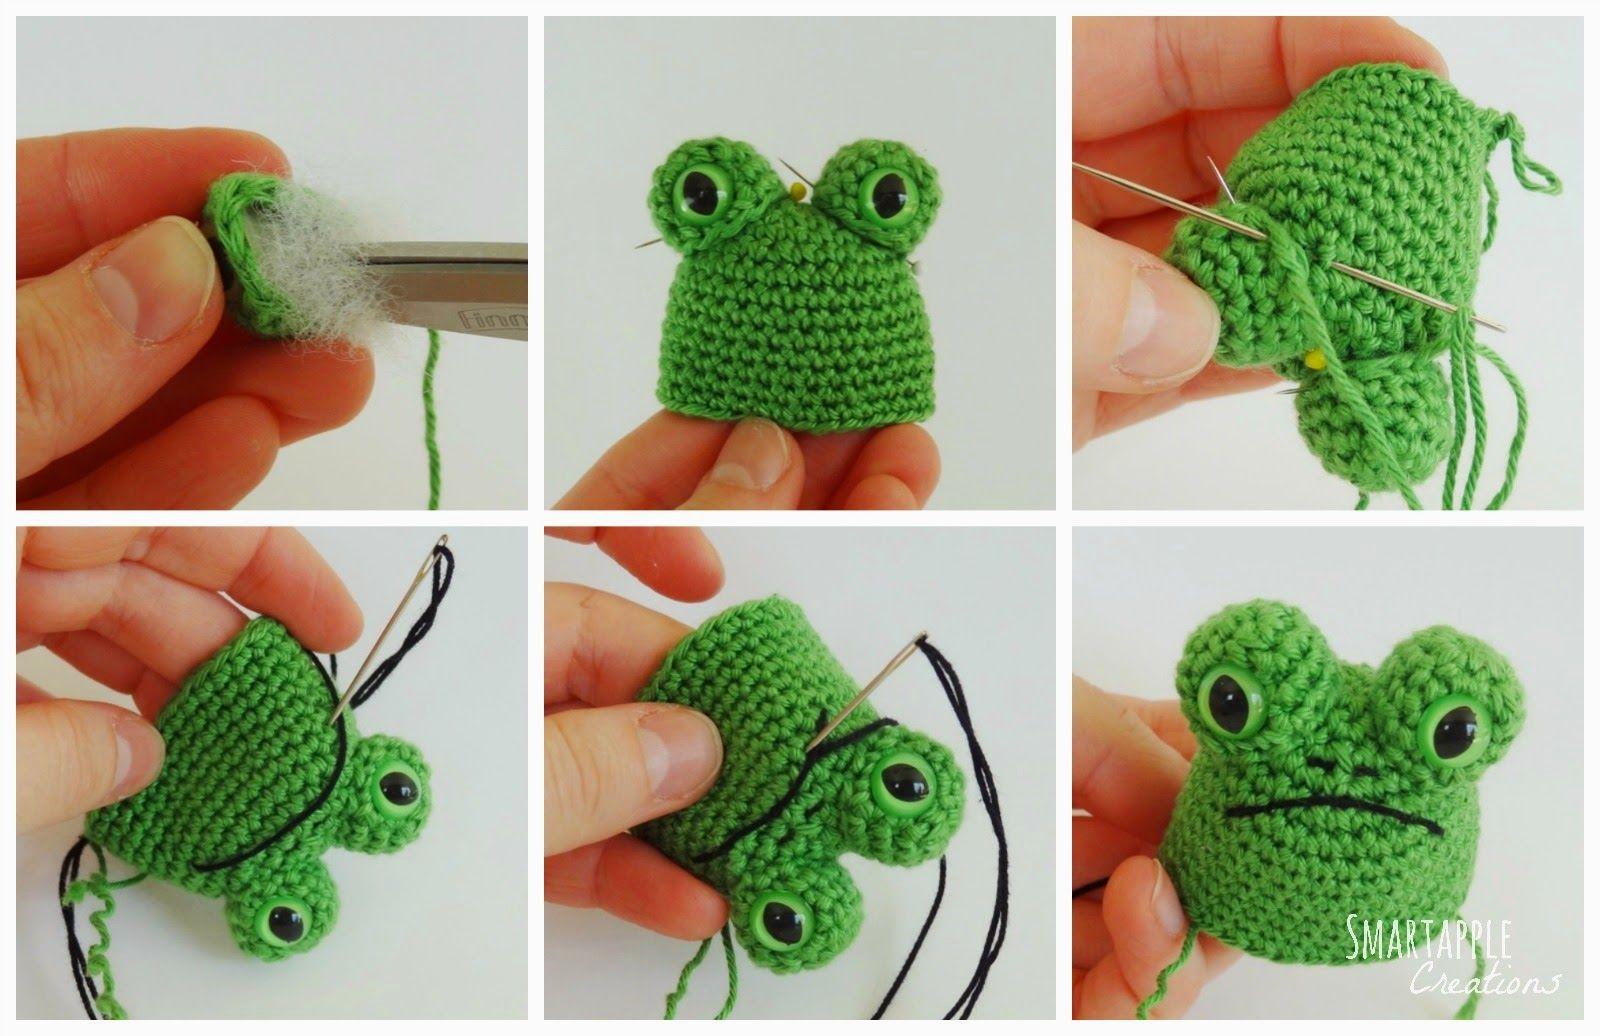 Smartapple Creations - amigurumi and crochet: Free pattern - Fred ...